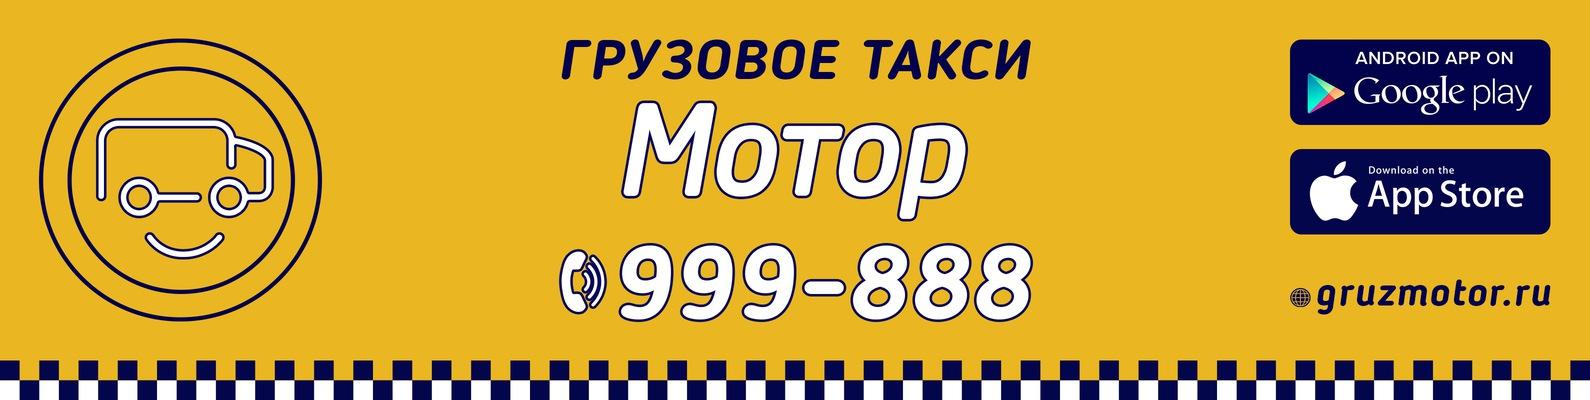 Картинки по запросу Грузовое такси мотор